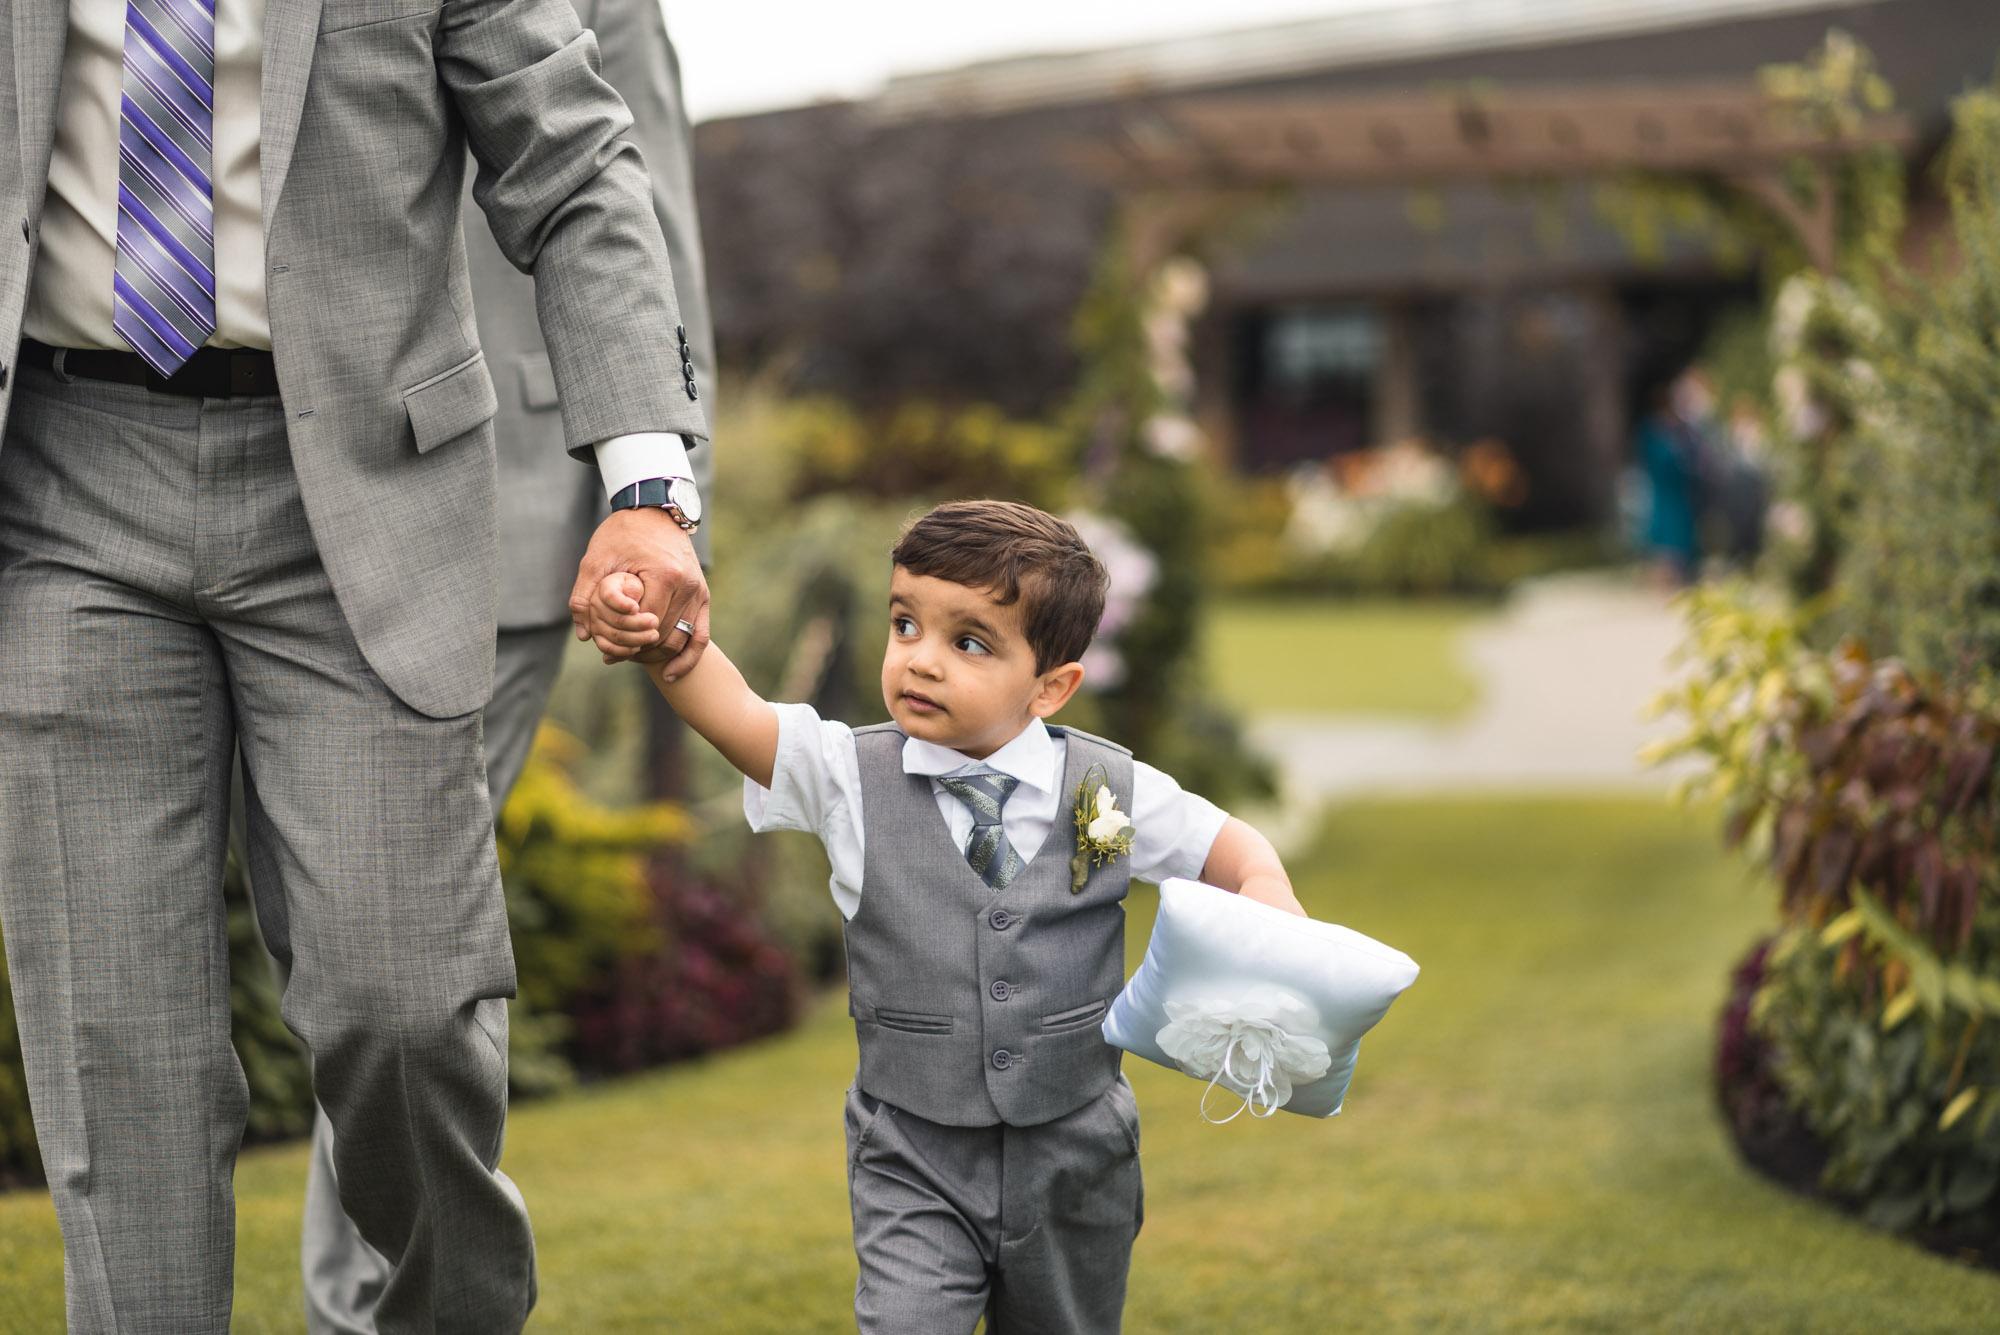 Ring bearer walking with dad